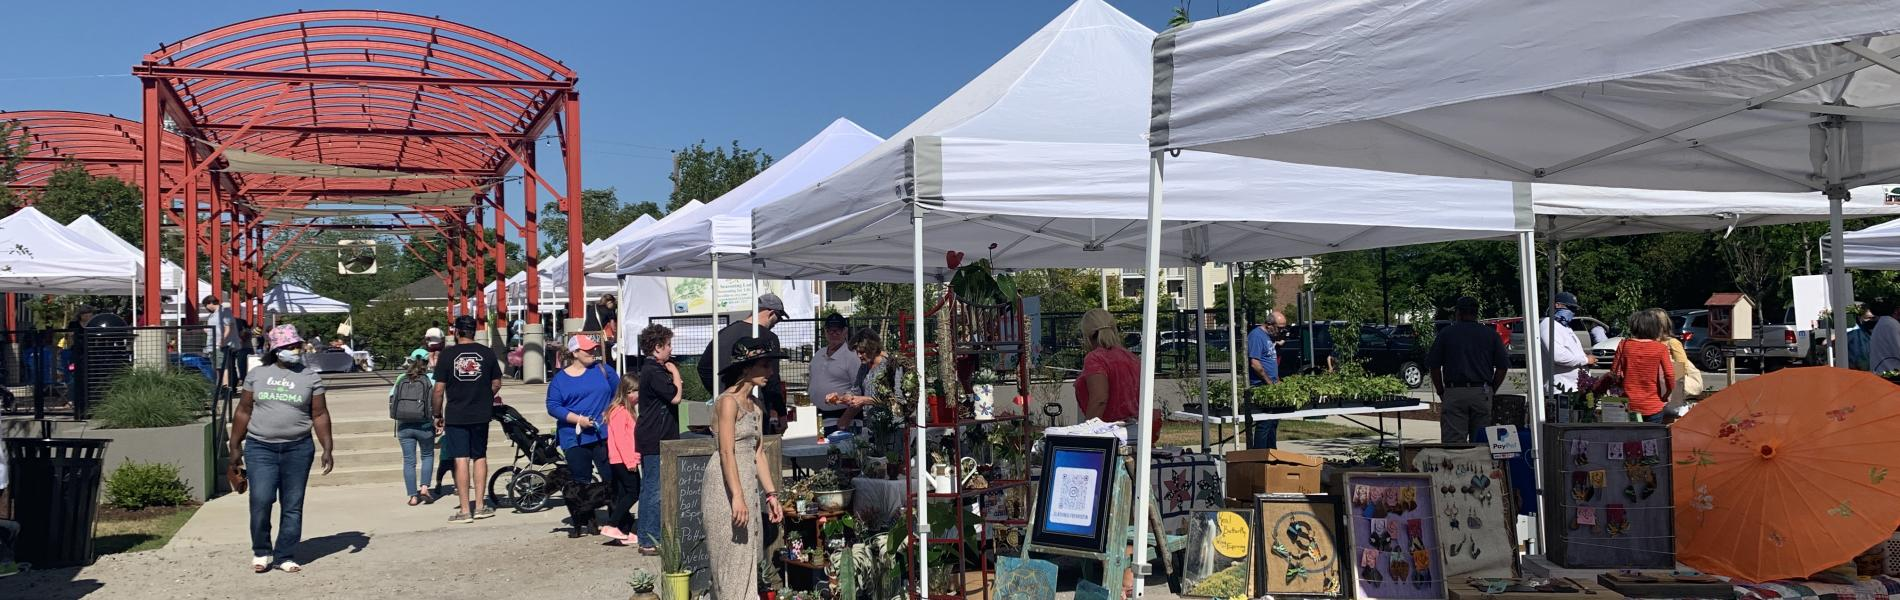 The Saturday market at the City Center Market